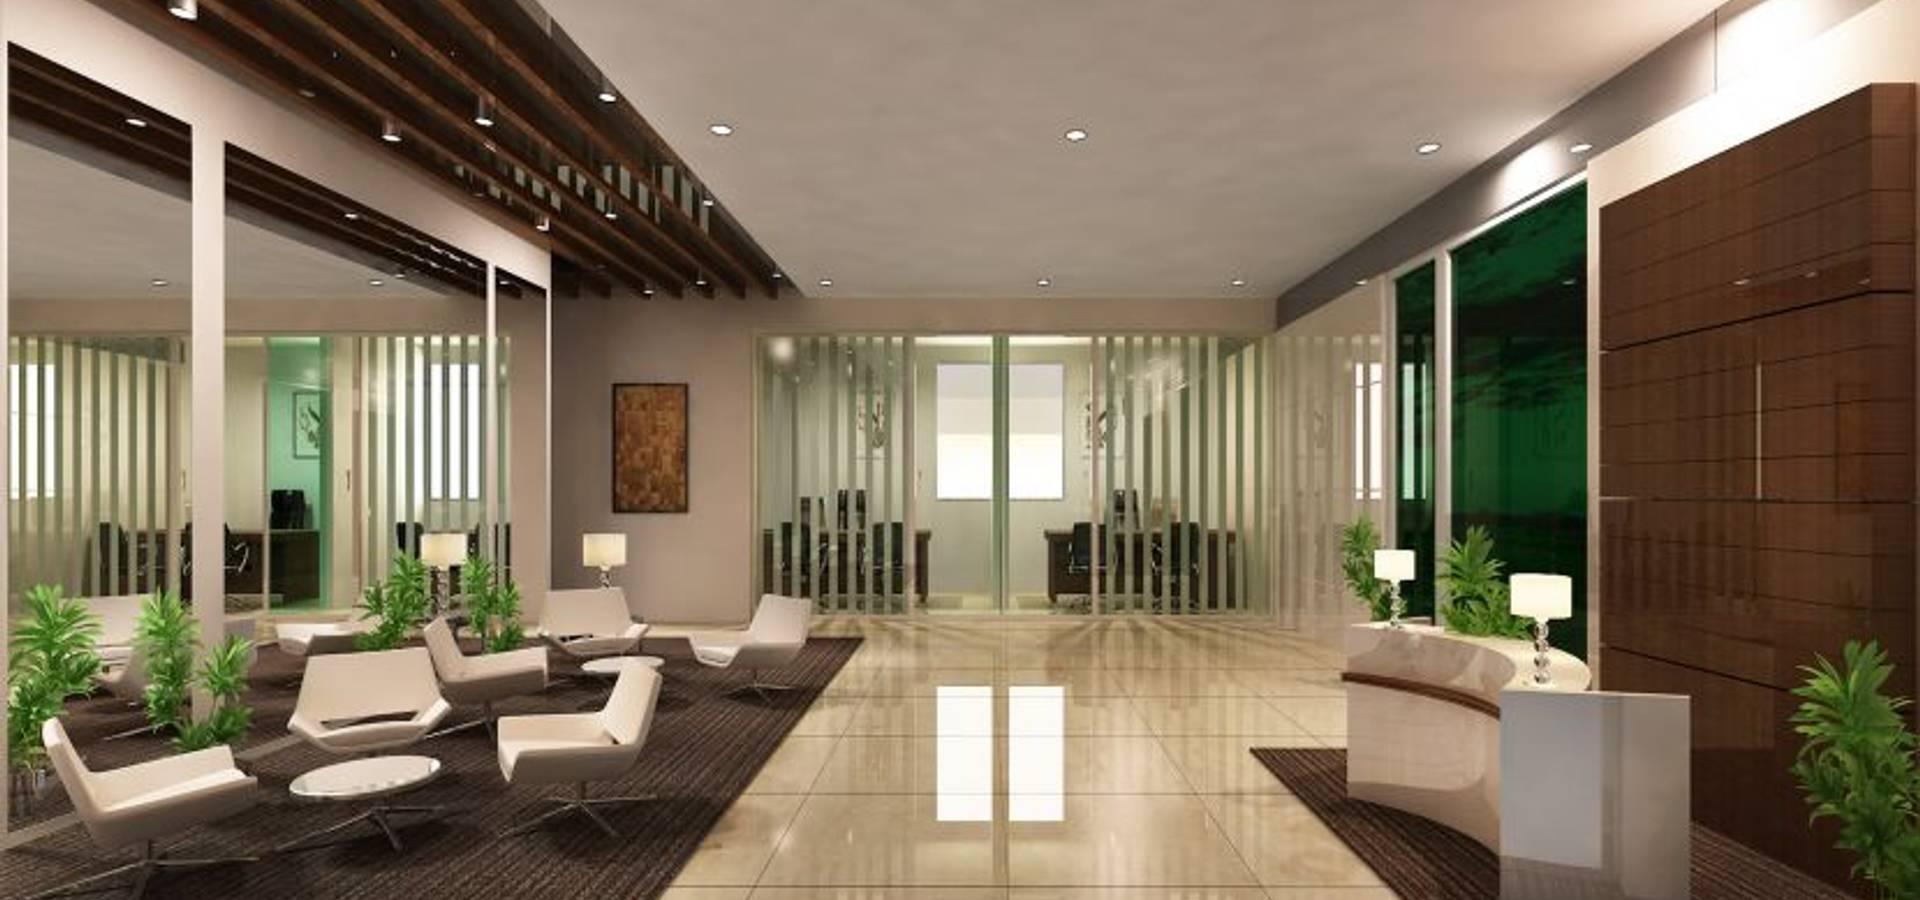 Saffron Touch—Interior Architecture Construction